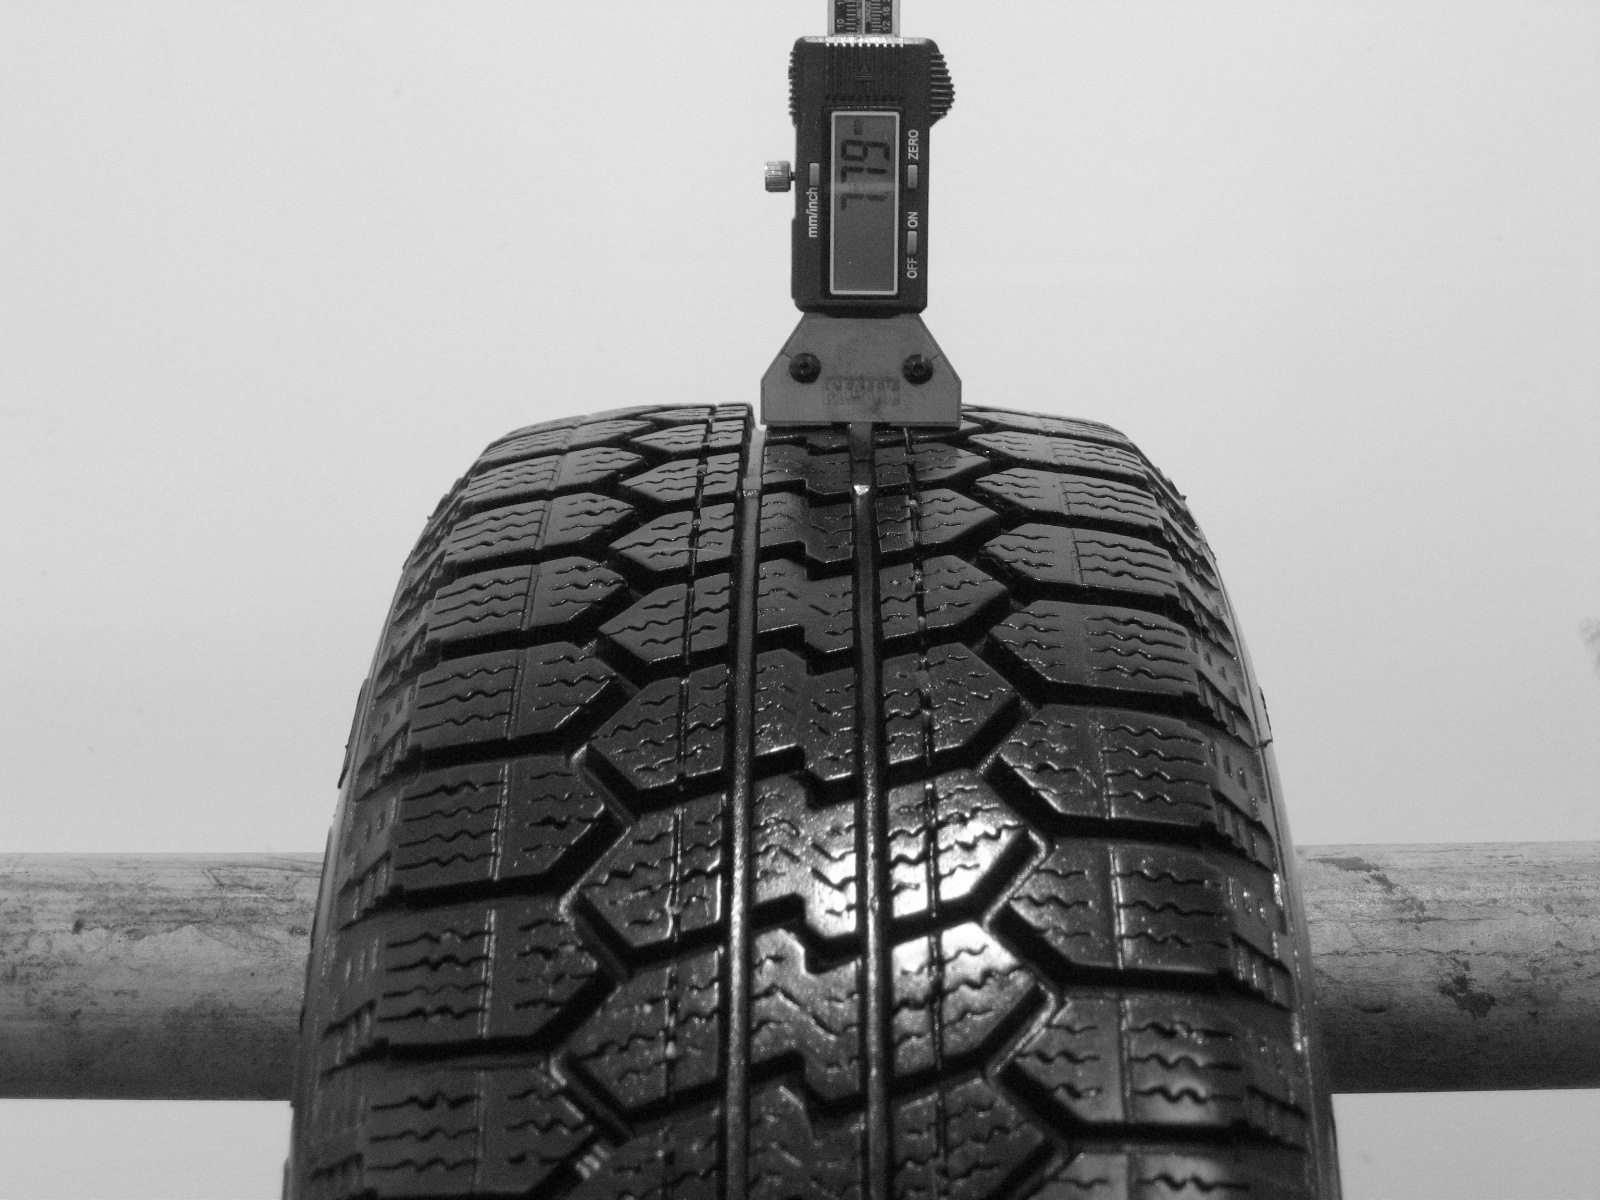 Použité-Pneu-Bazar - 185/60 R14 HANKOOK ZOVAC 2000 M+S-kusovka-rezerva 3mm